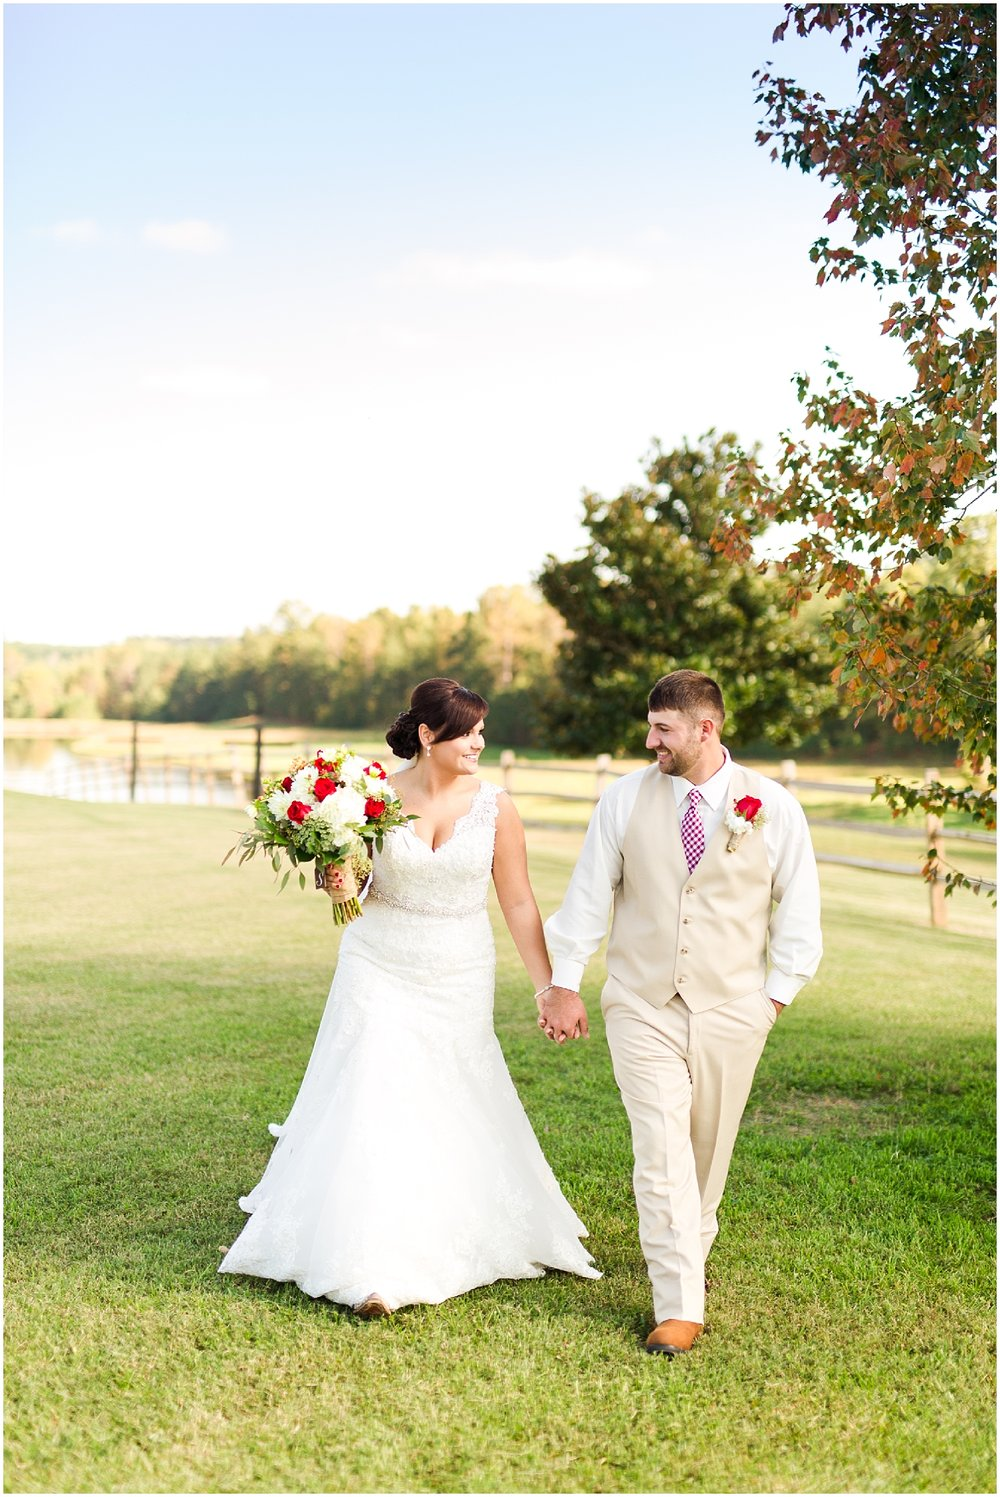 Rustic Country Wedding Virginia Photographer (18).jpg